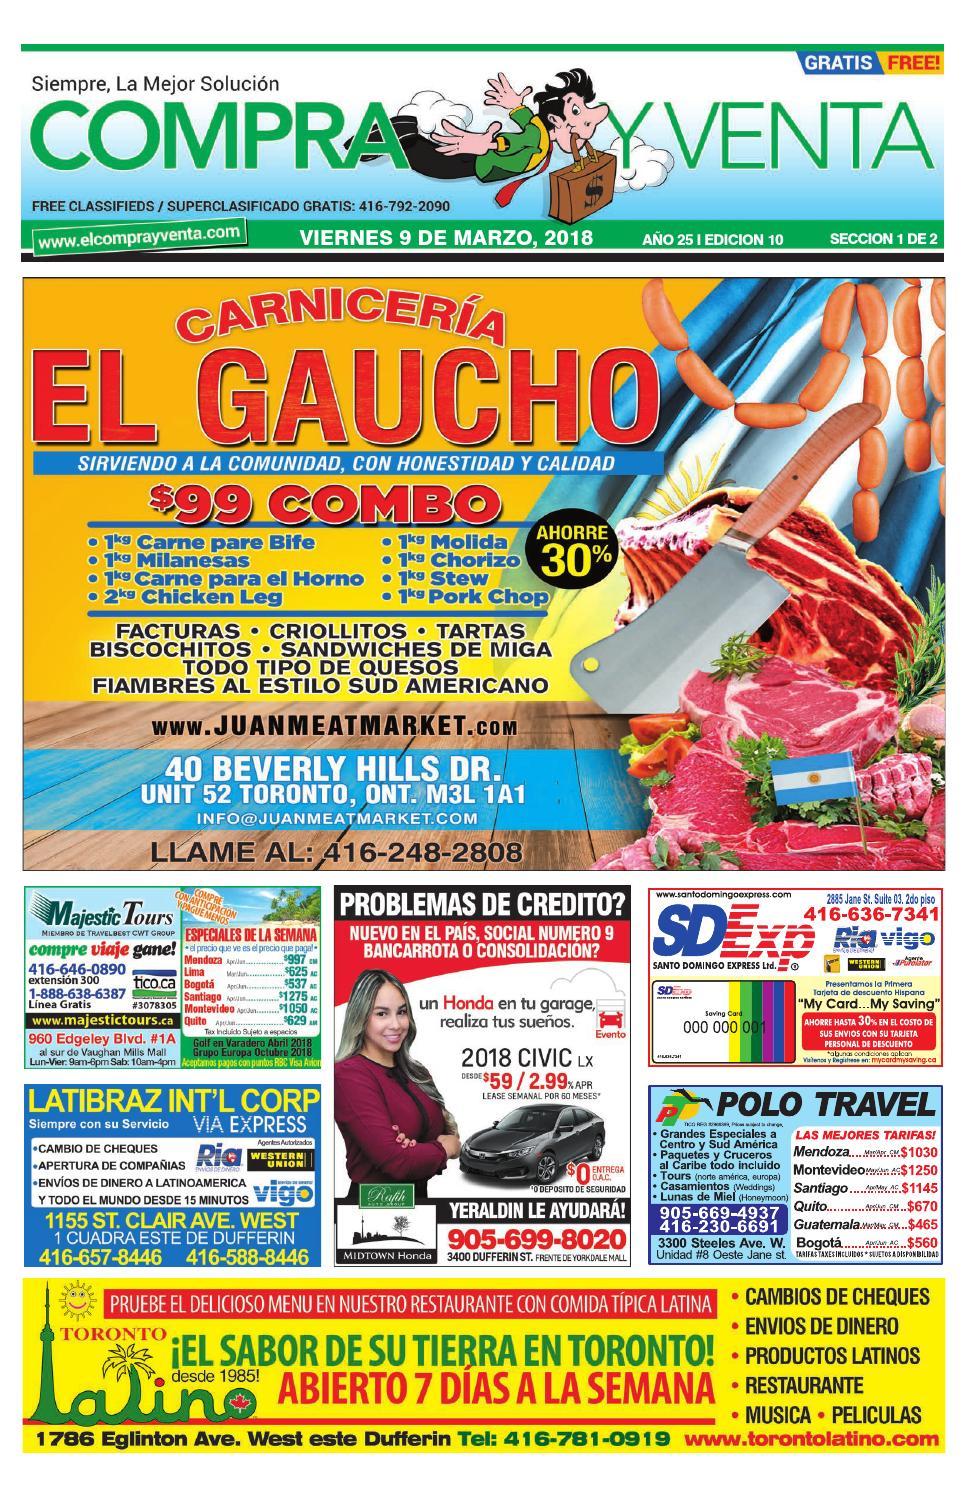 Compra y Venta Edicion  10. 2018 by elcomprayventa - issuu 48f19daa4a2